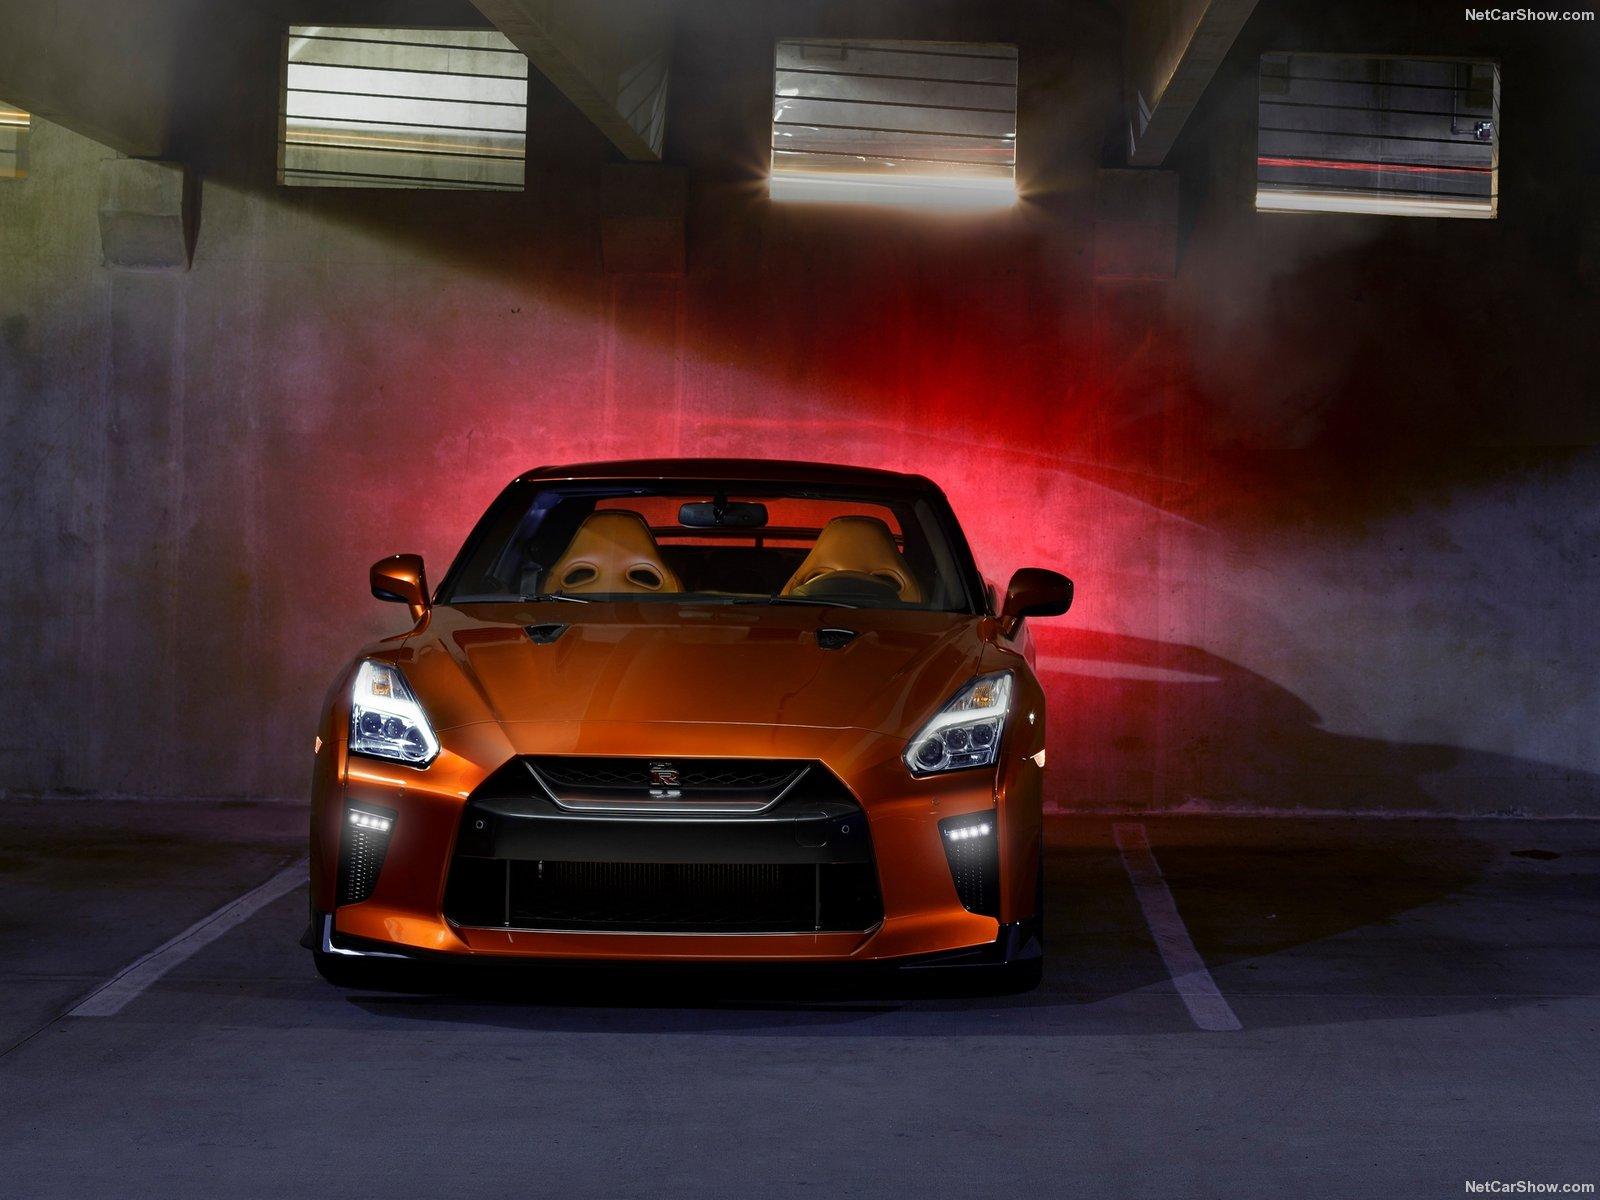 Nissan-GT-R_2017_1600x1200_wallpaper_12